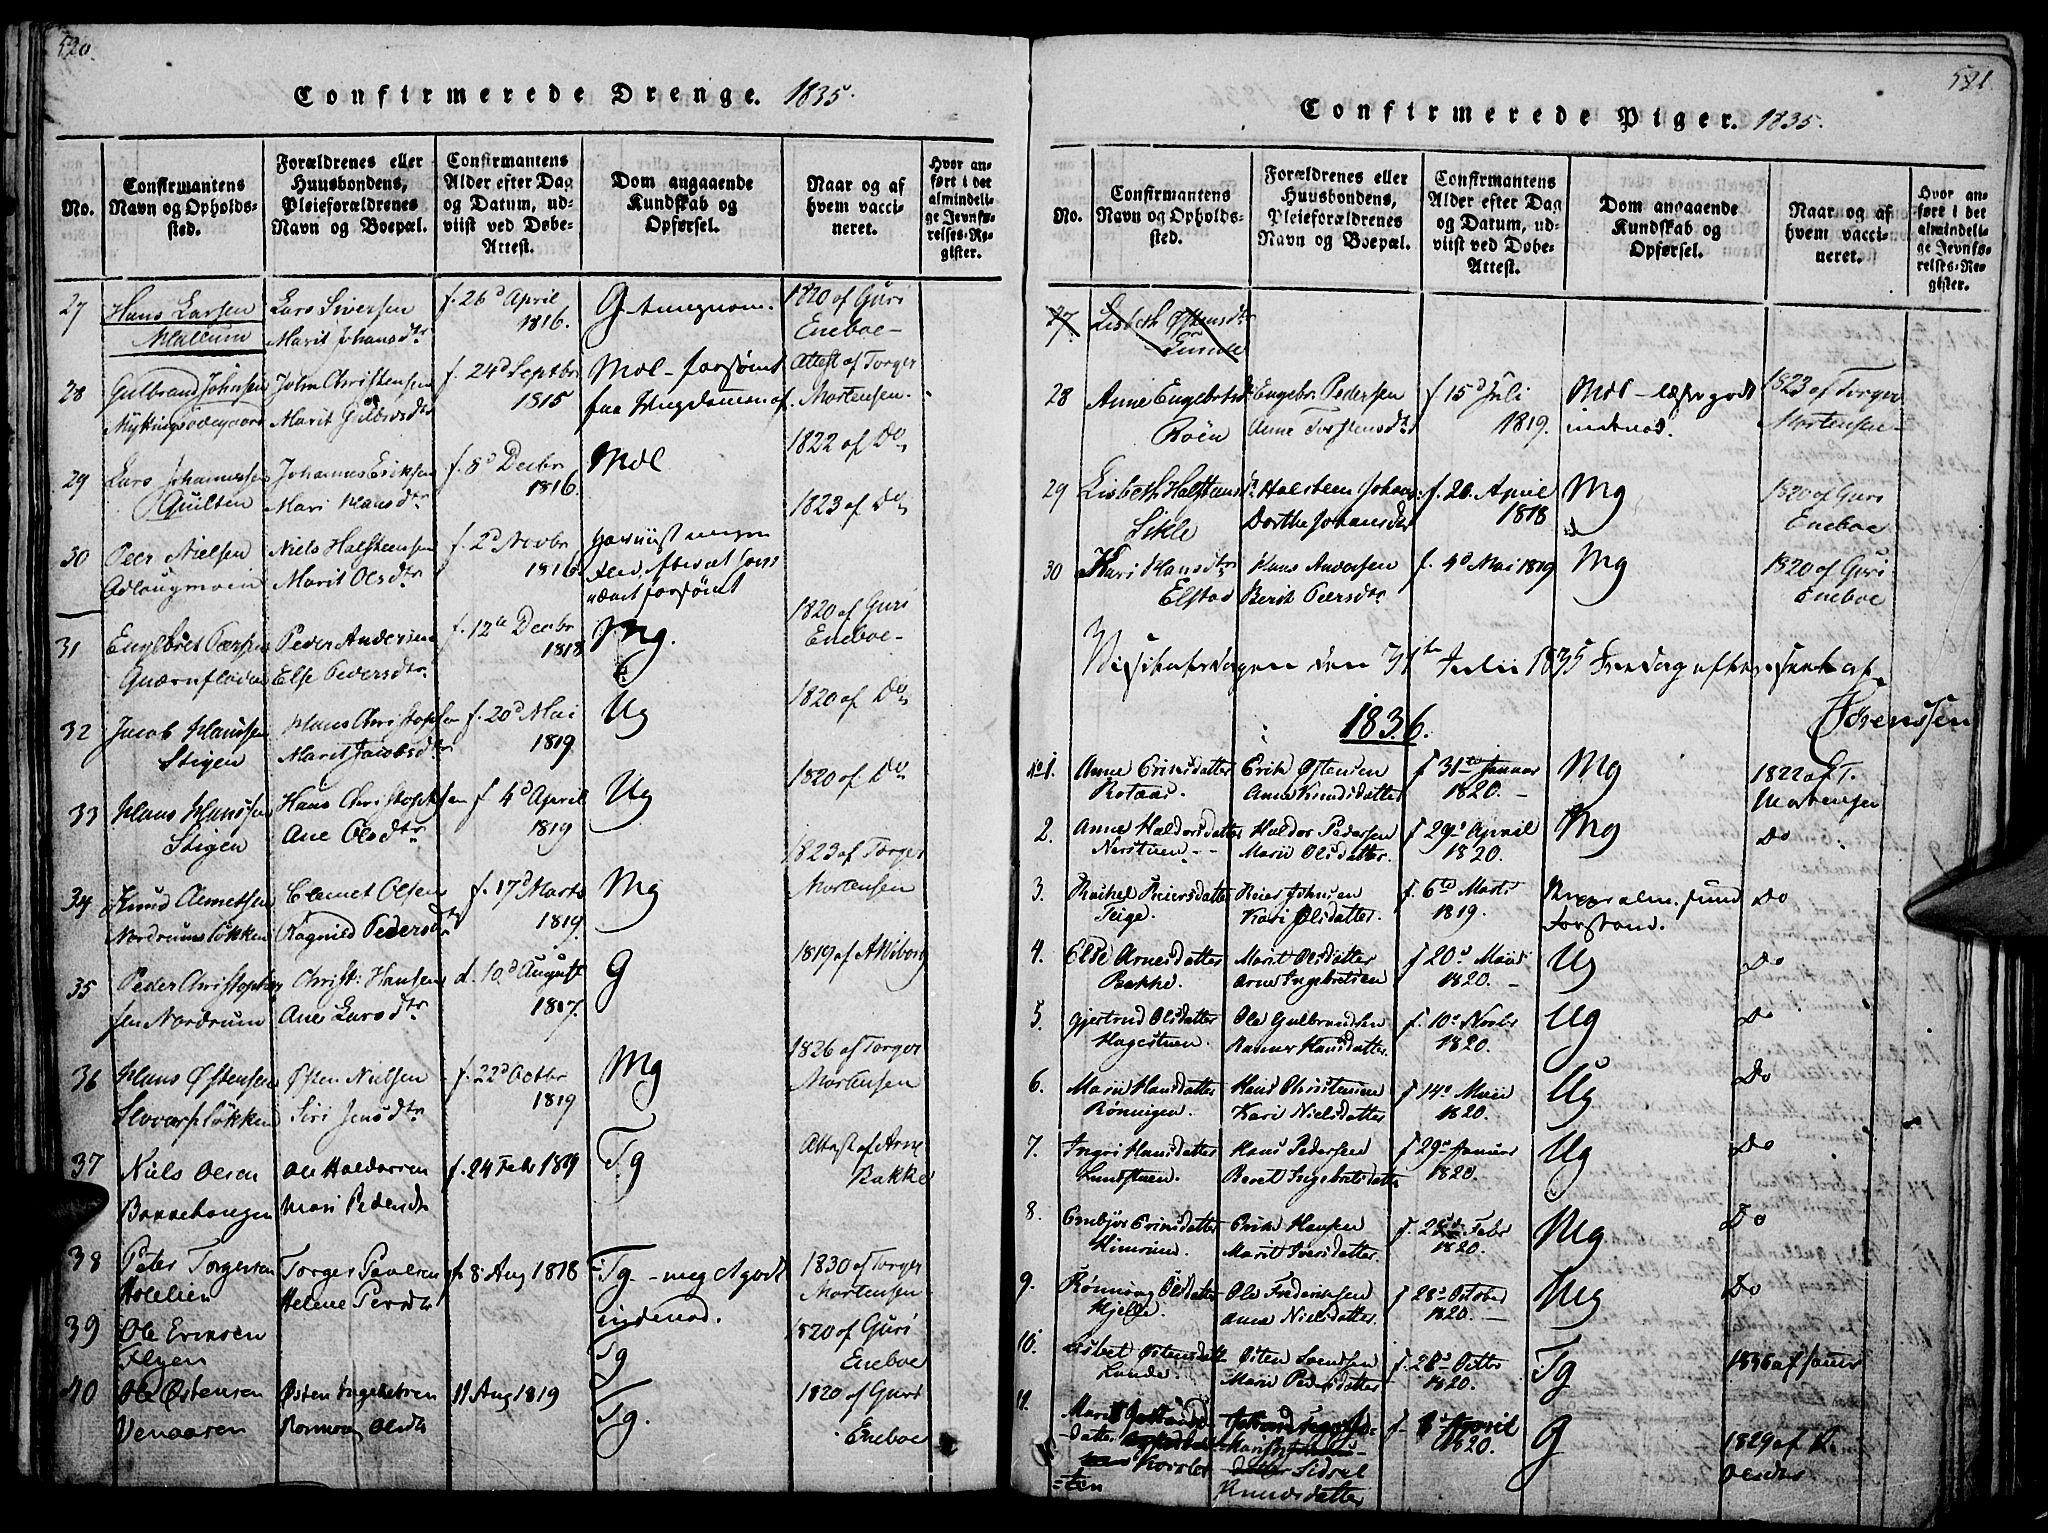 SAH, Ringebu prestekontor, Ministerialbok nr. 4, 1821-1839, s. 520-521